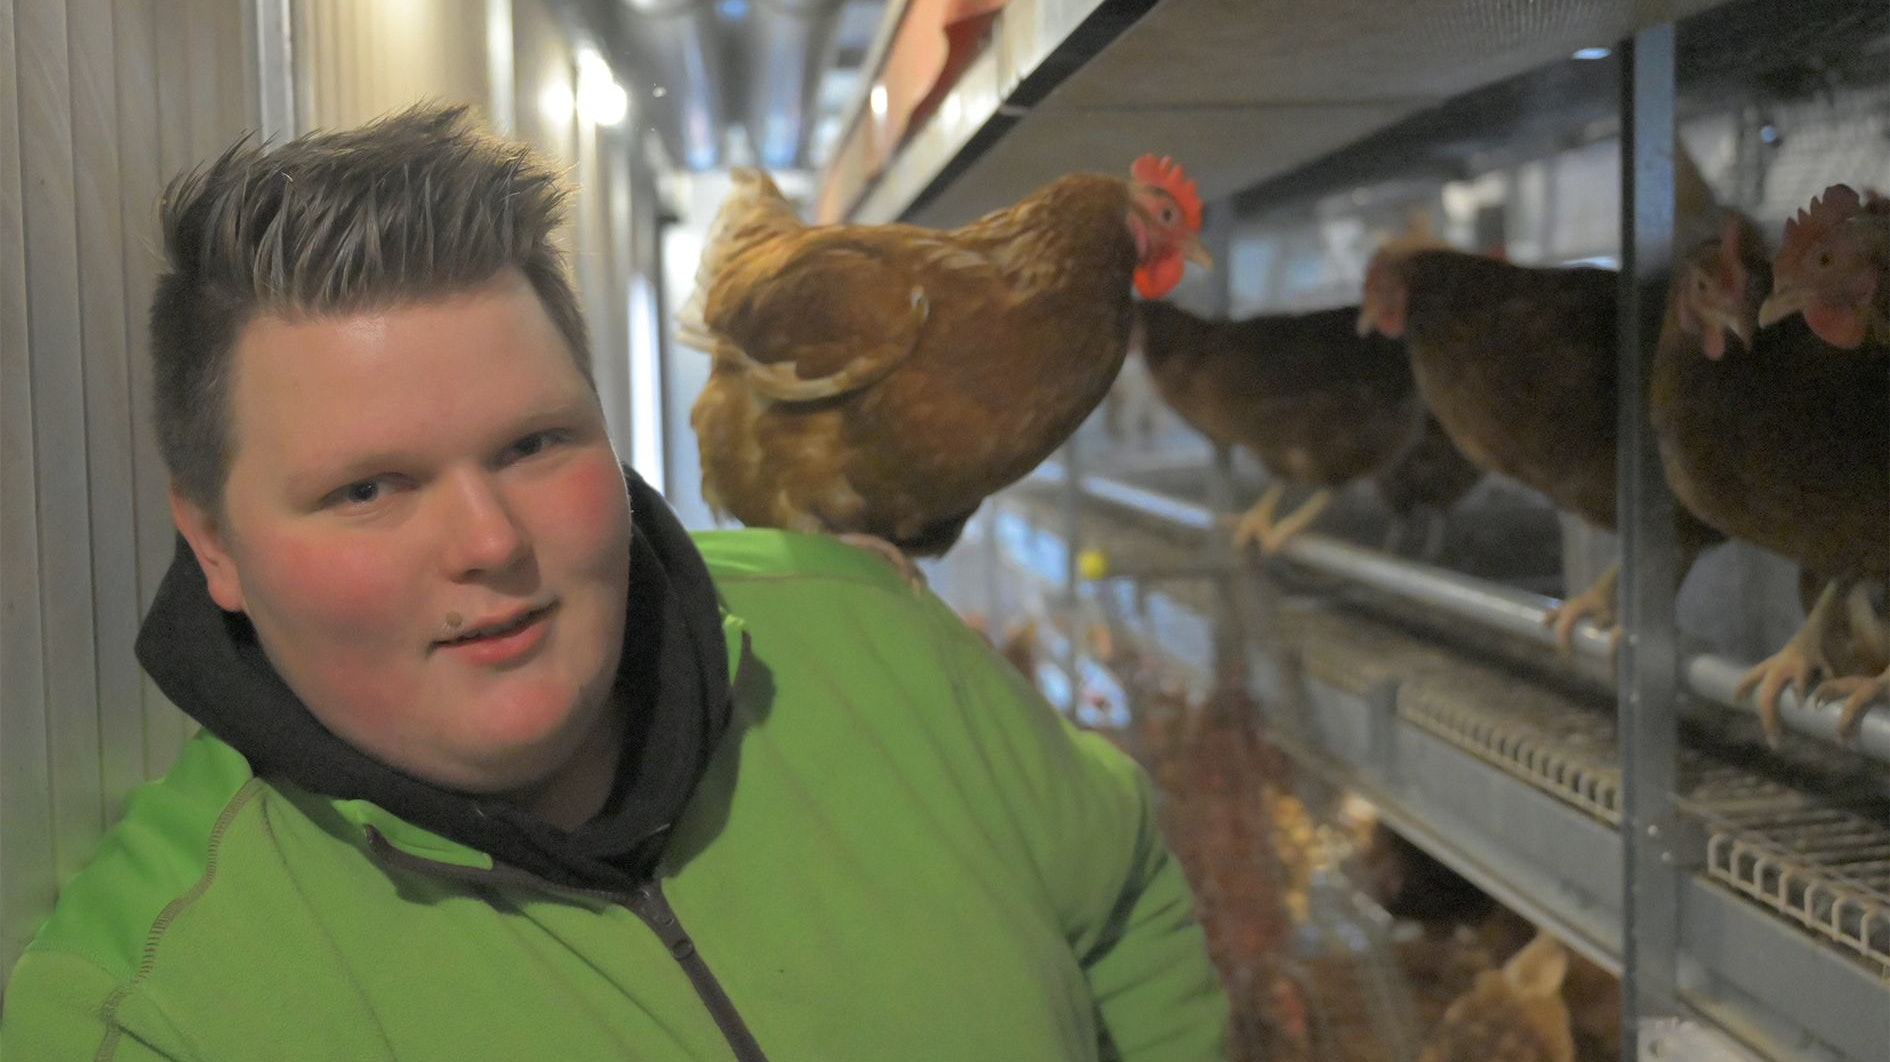 Schnappschuss mit Huhn: Fabian Kurre im mobilen Stall. Foto: Duszat